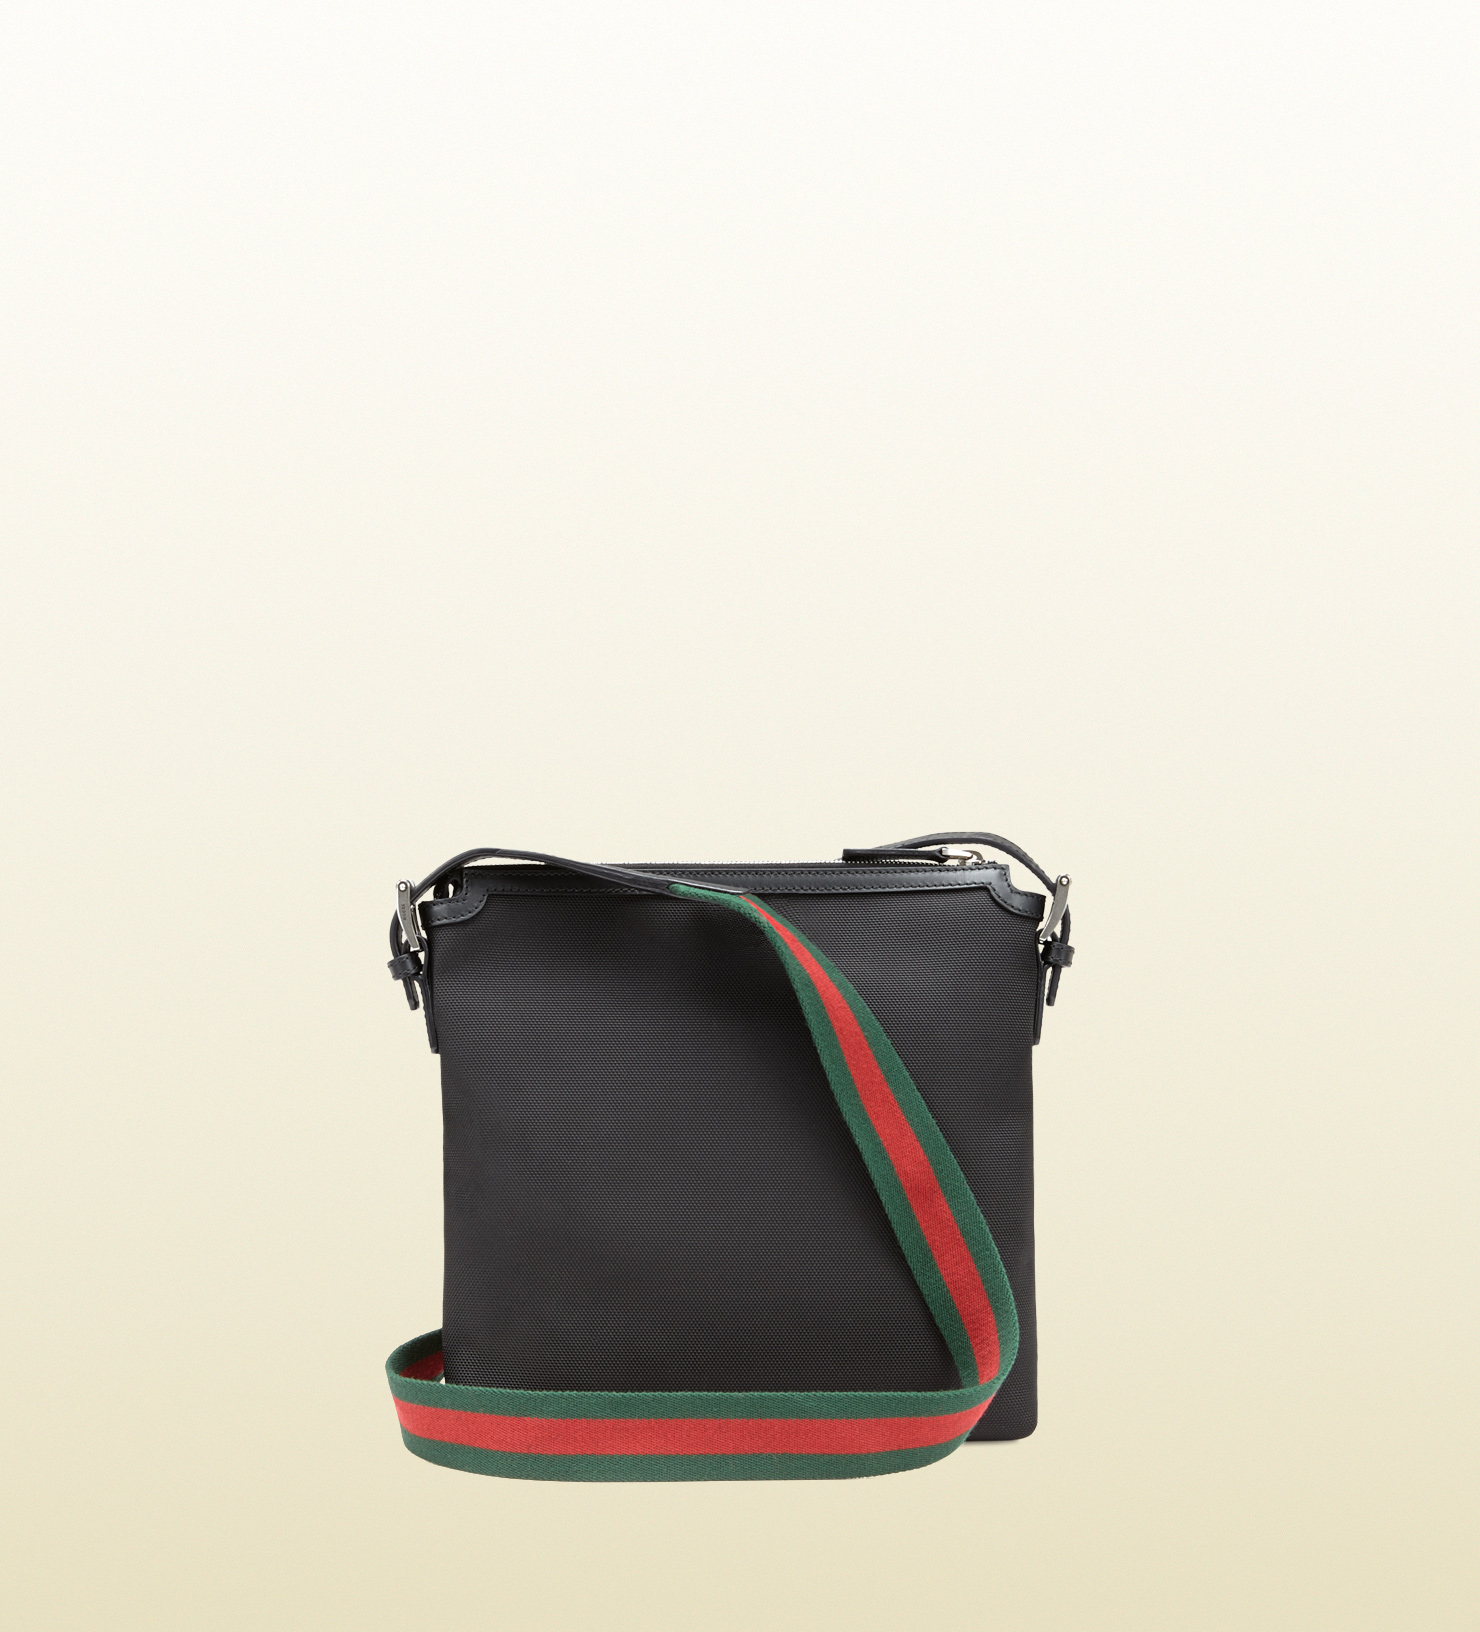 f5315ce47381 Gucci Techno Canvas Messenger Bag in Black for Men - Lyst